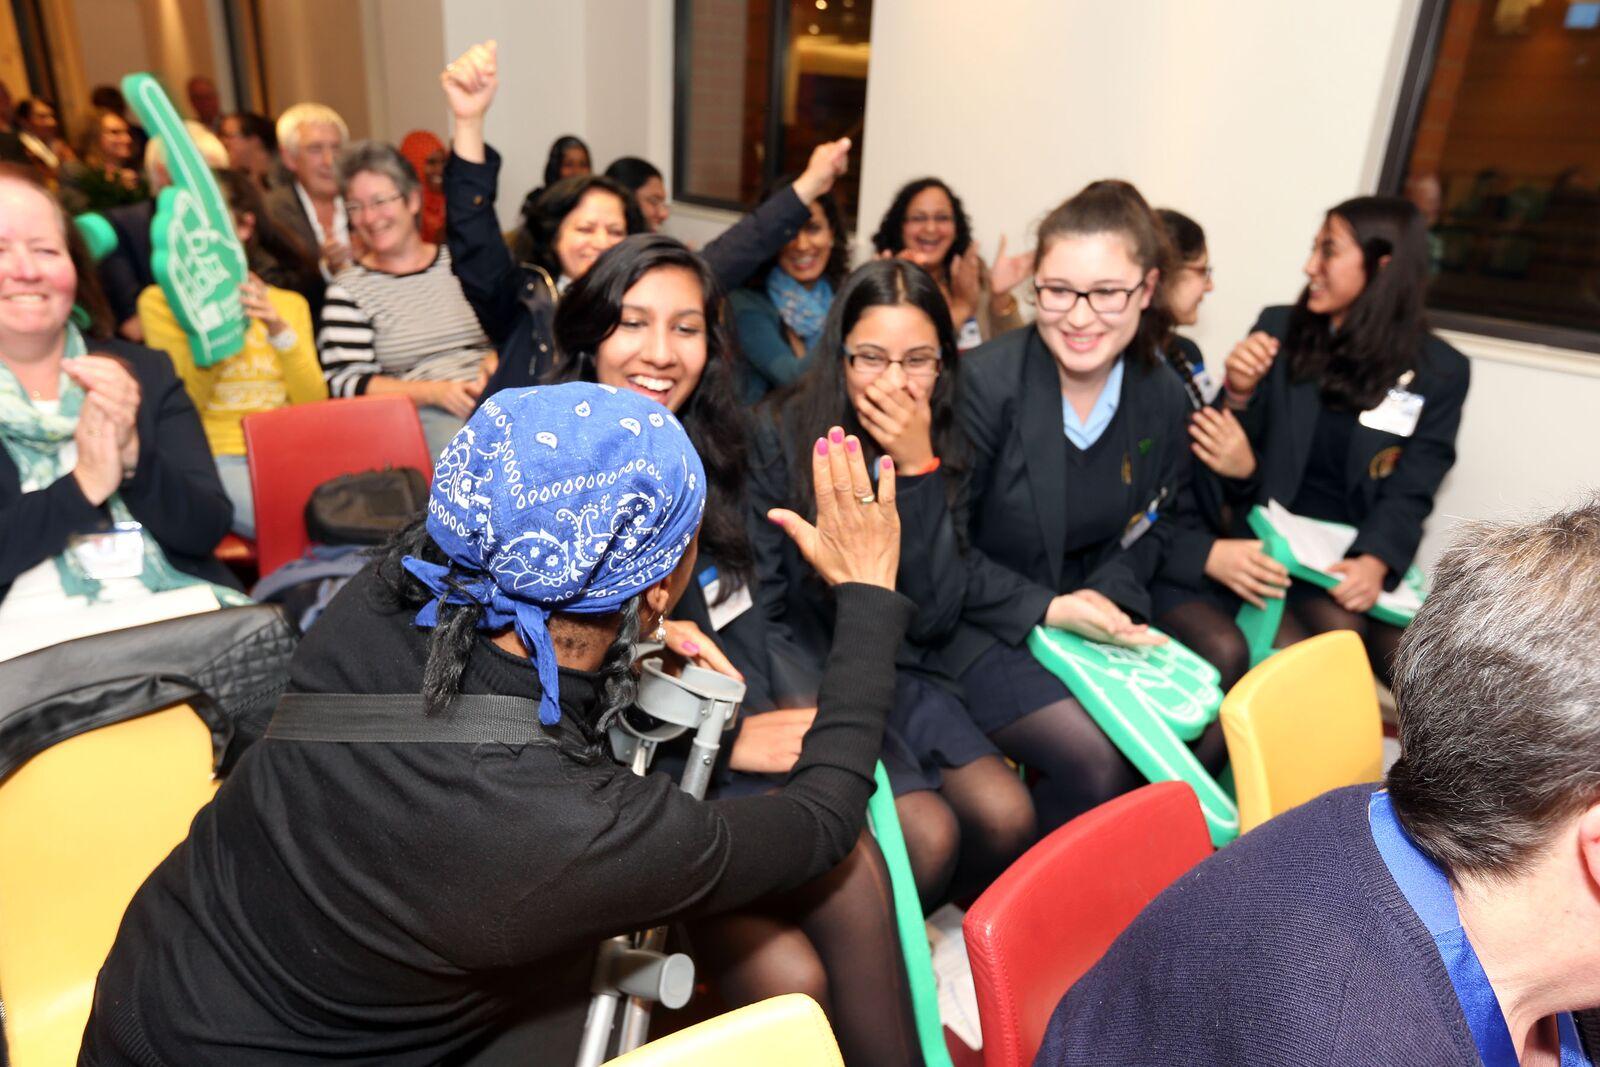 Birmingham Civic Society - What we do